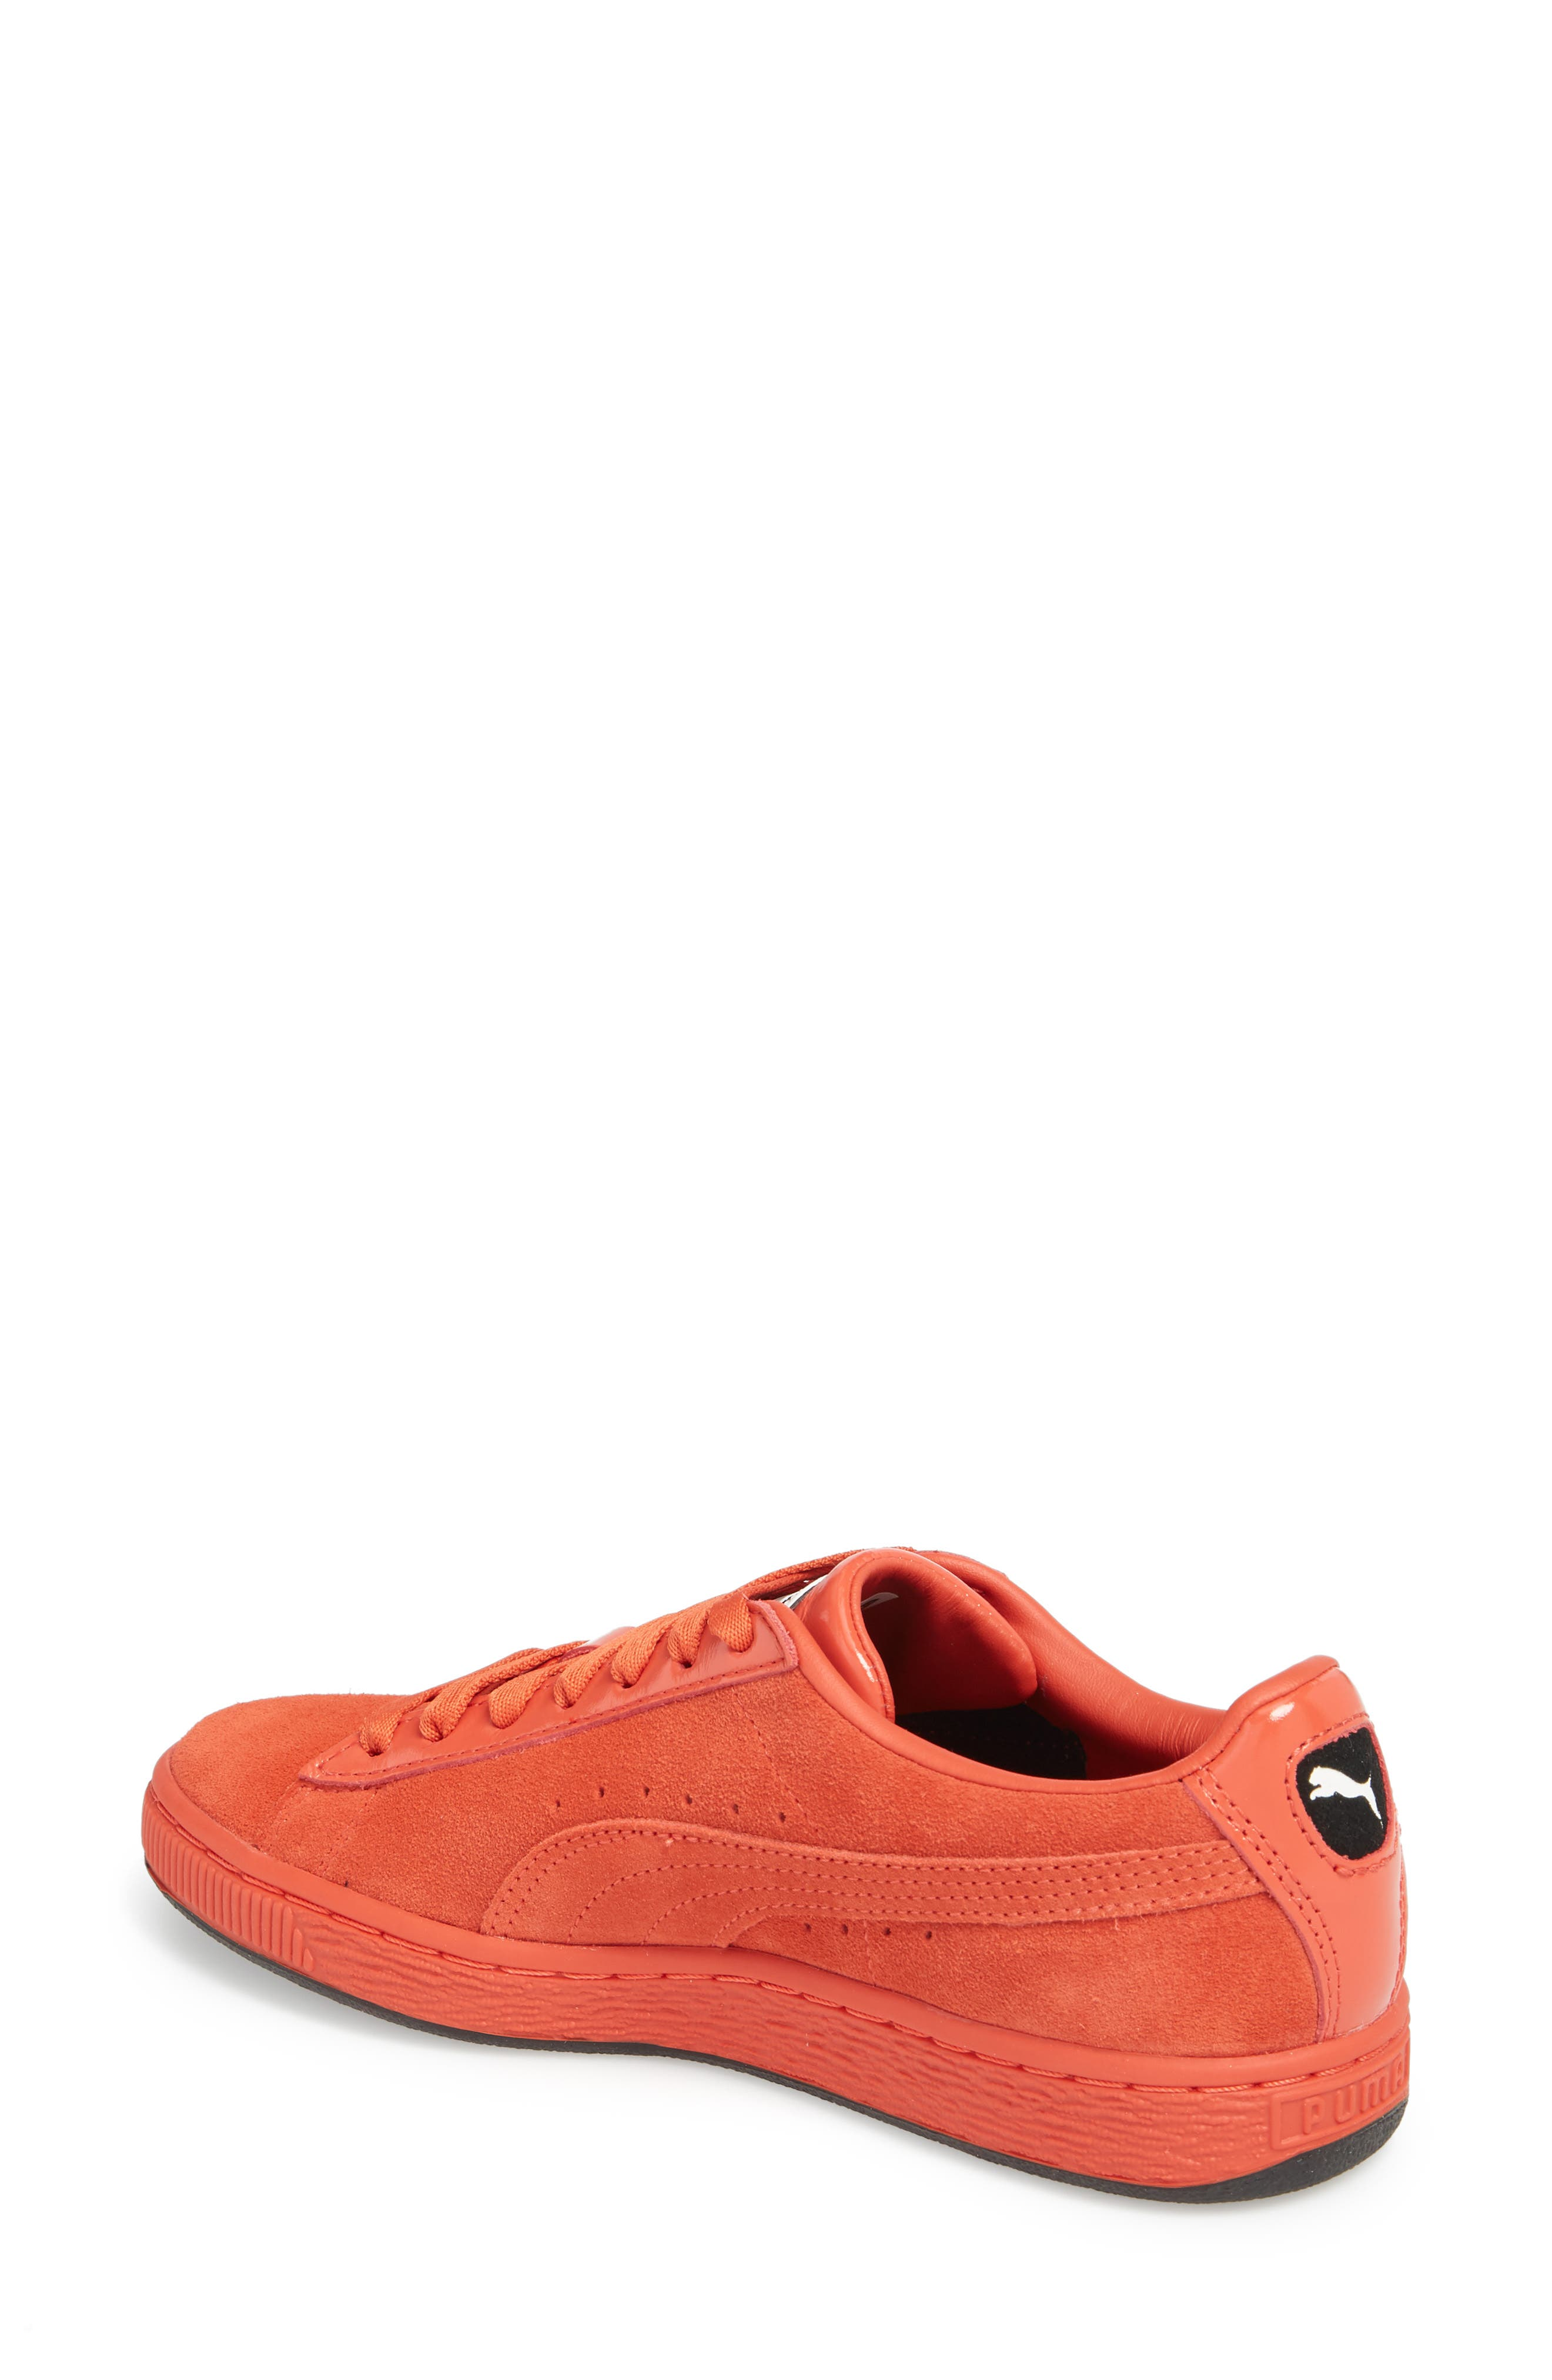 PUMA,                             x MAC ONE Suede Classic Sneaker,                             Alternate thumbnail 2, color,                             600